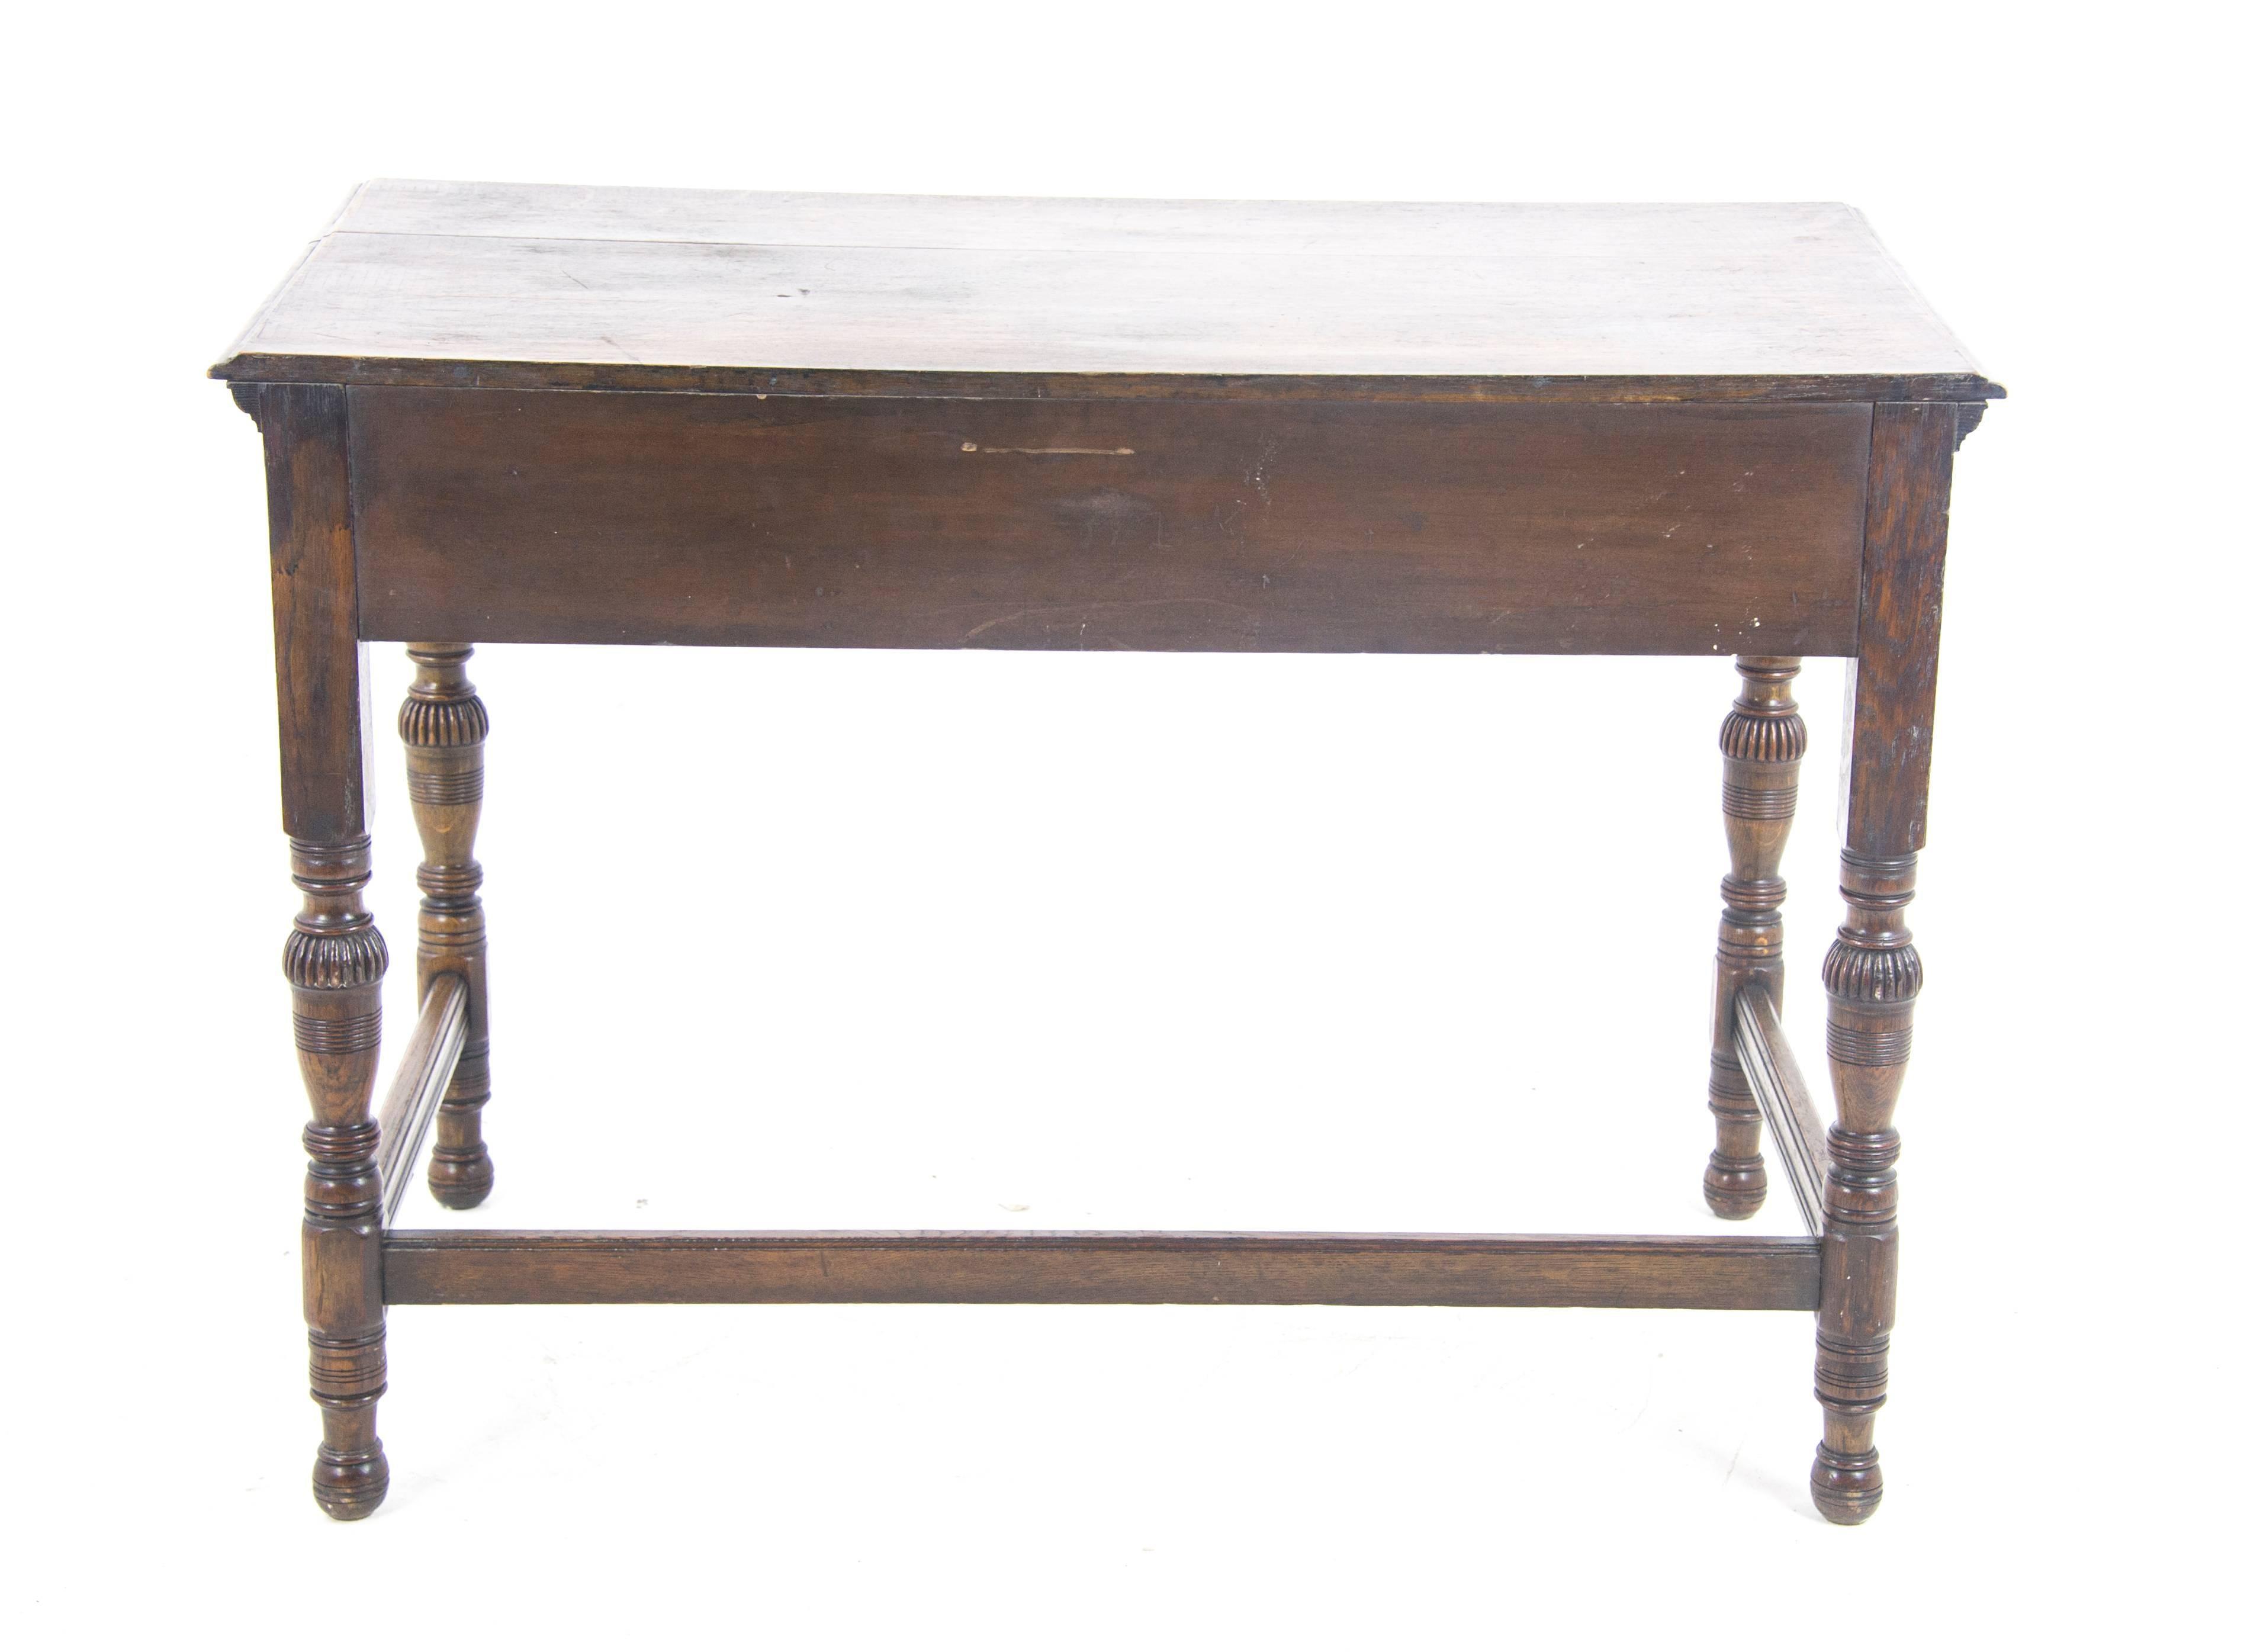 Delicieux Antique Hall Table, Vintage Writing Table, Oak Desk, Scotland, 1910 For Sale